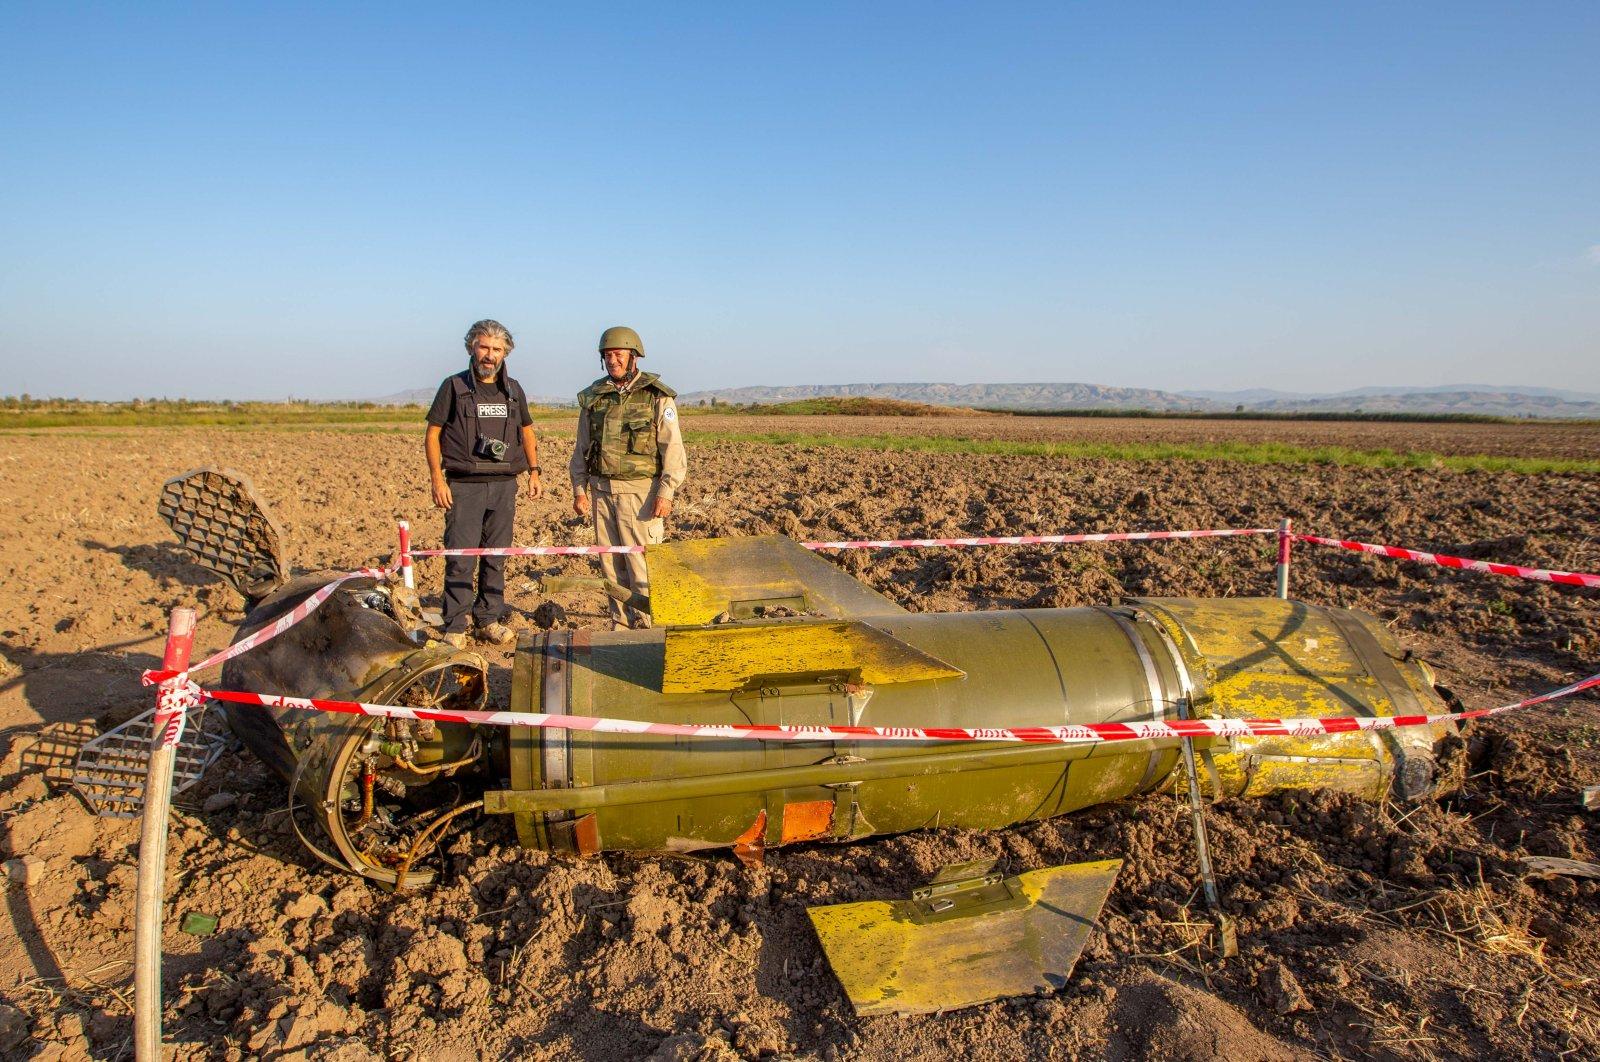 De-mining expert Azer Huseyinov stands in front of a Tochka-U missile with Sabah daily reporter Uğur Yıldırım in the town of Fuzuli, Azerbaijan, Oct. 12, 2020. (Rıza Özel Photo)